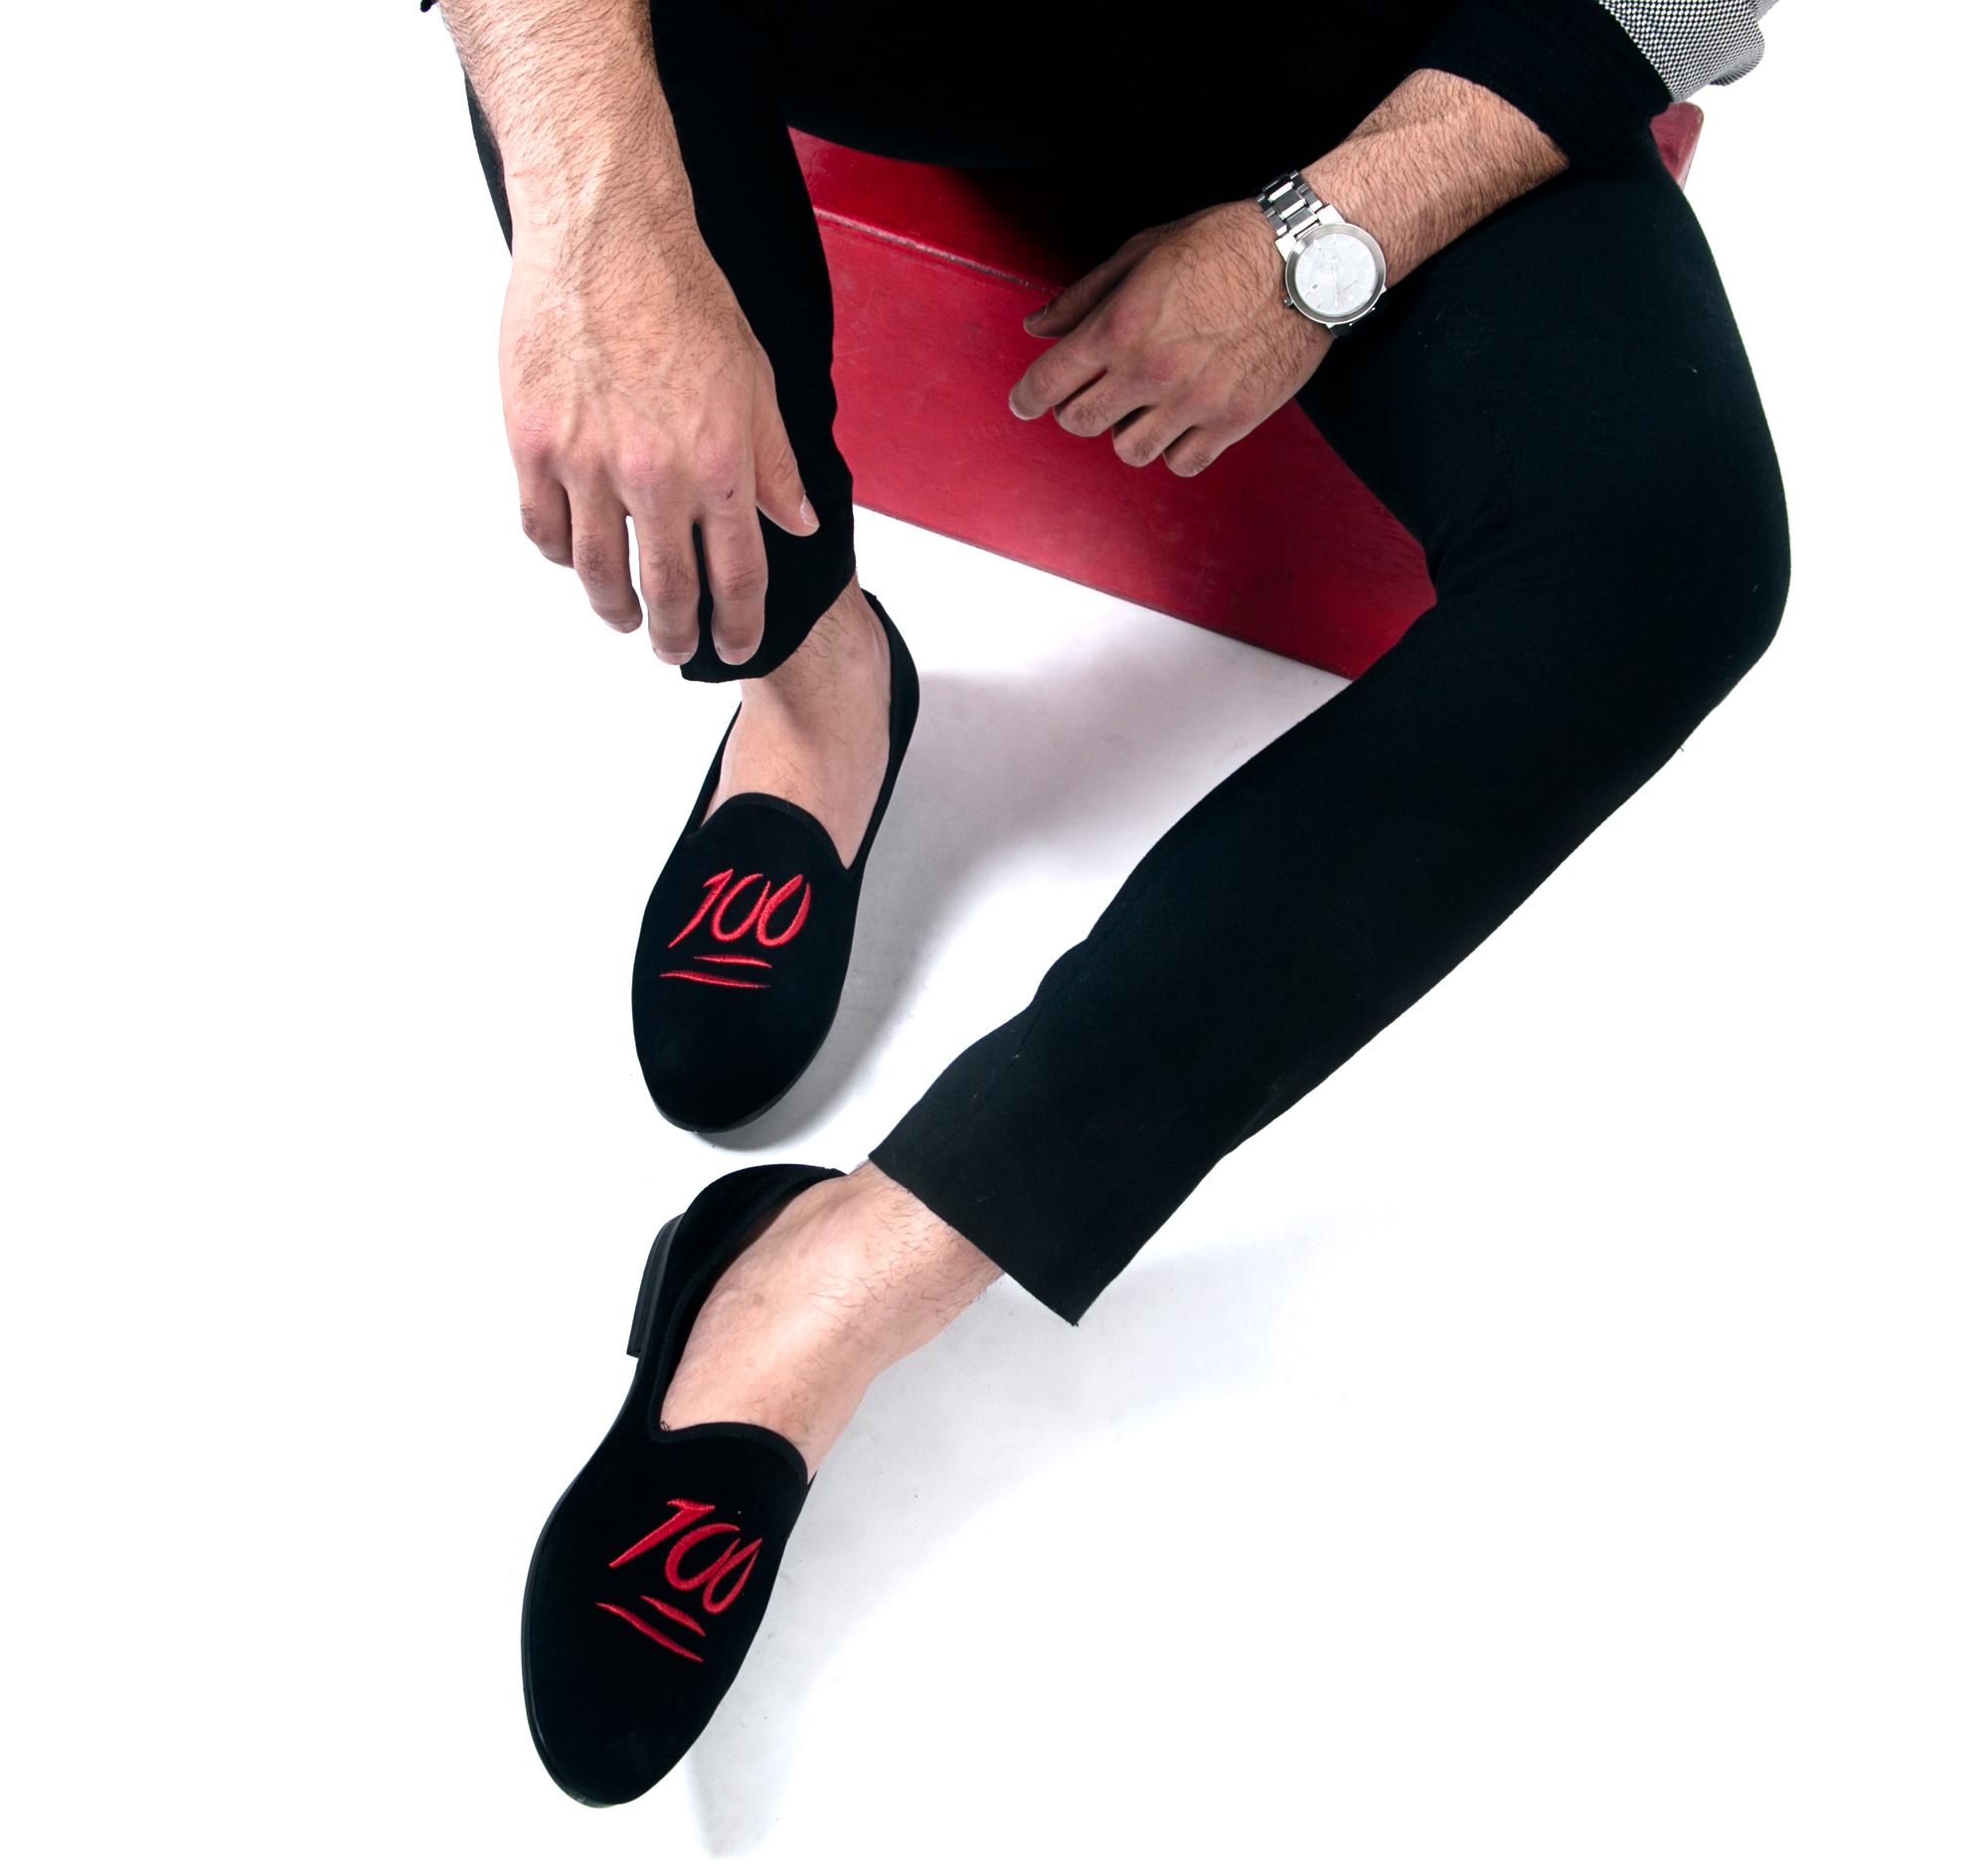 dara shoes milan velvet slippers in 100 emoji